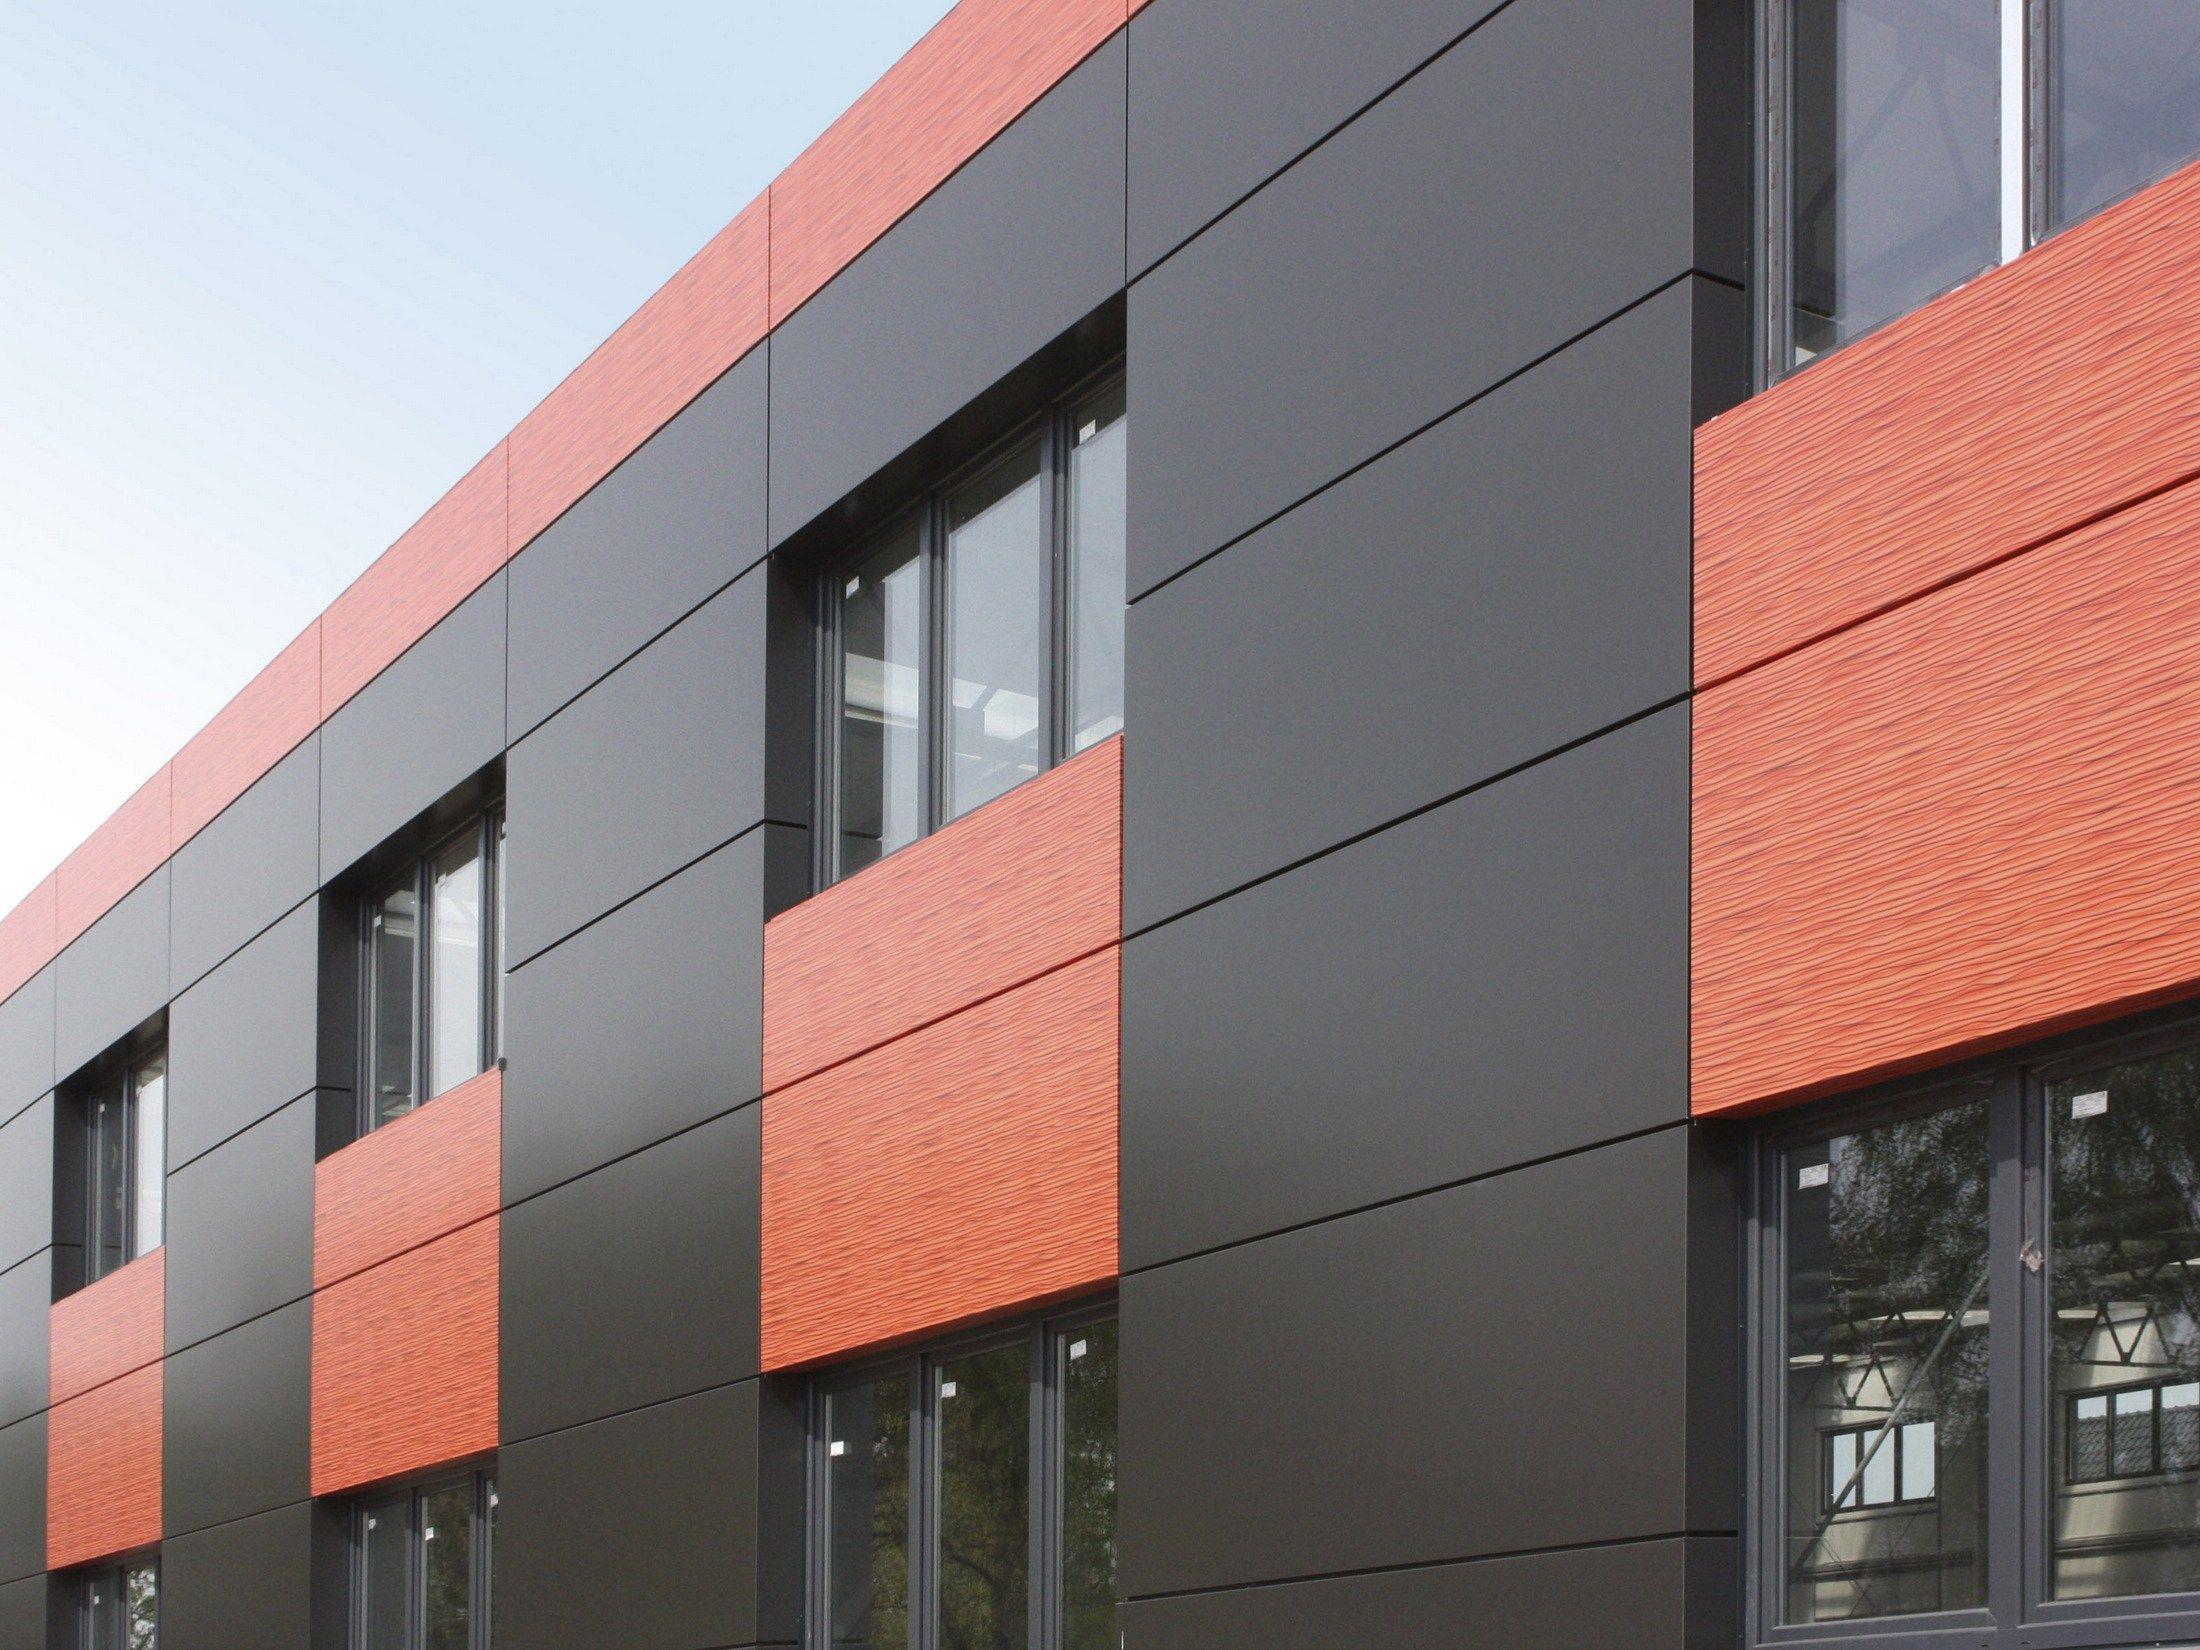 panel de composite alucobond design by 3a composites. Black Bedroom Furniture Sets. Home Design Ideas